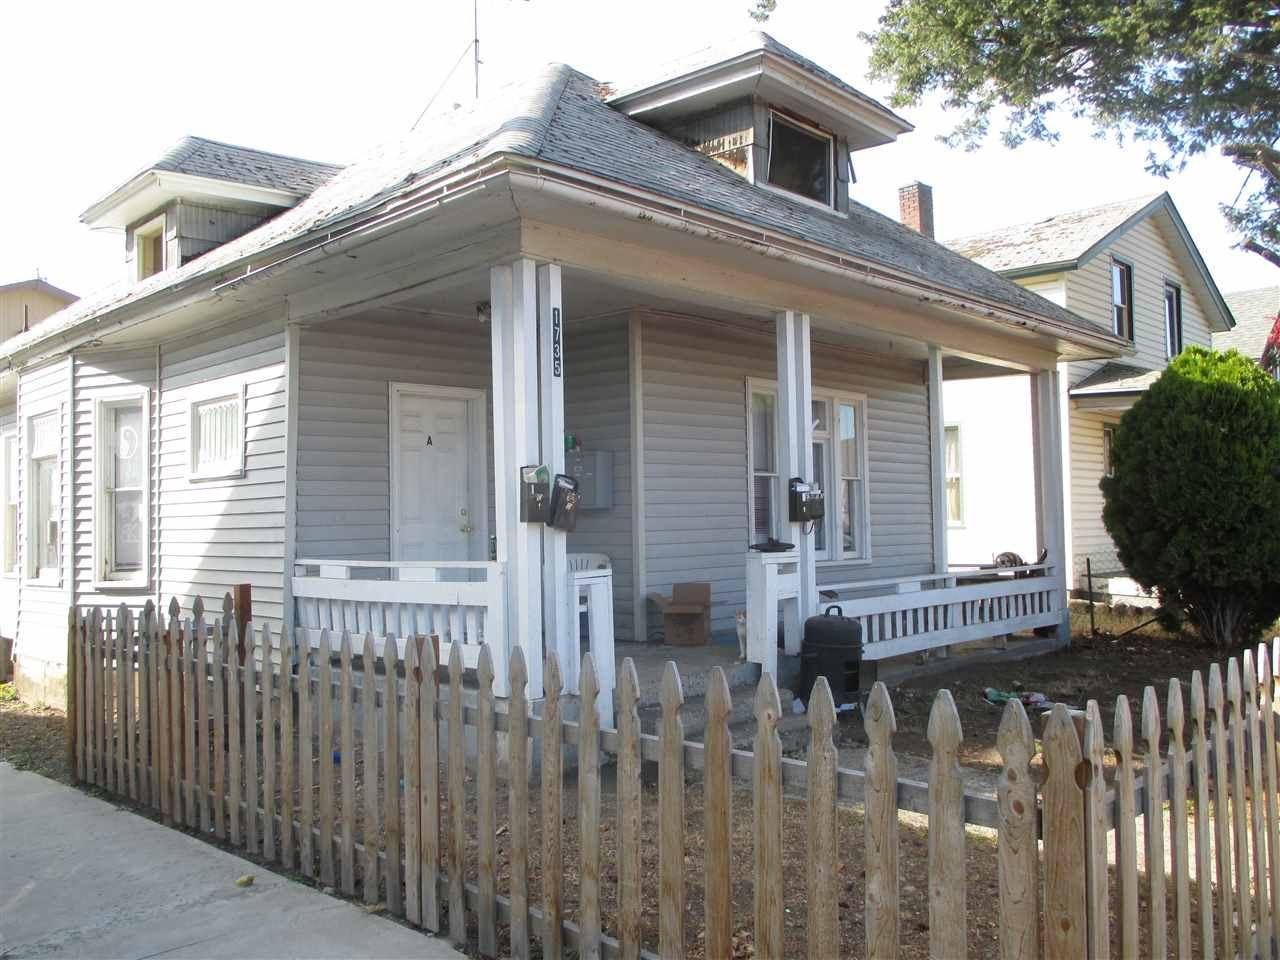 1735 W Boone Ave, Spokane, WA 99201 - #: 202025392